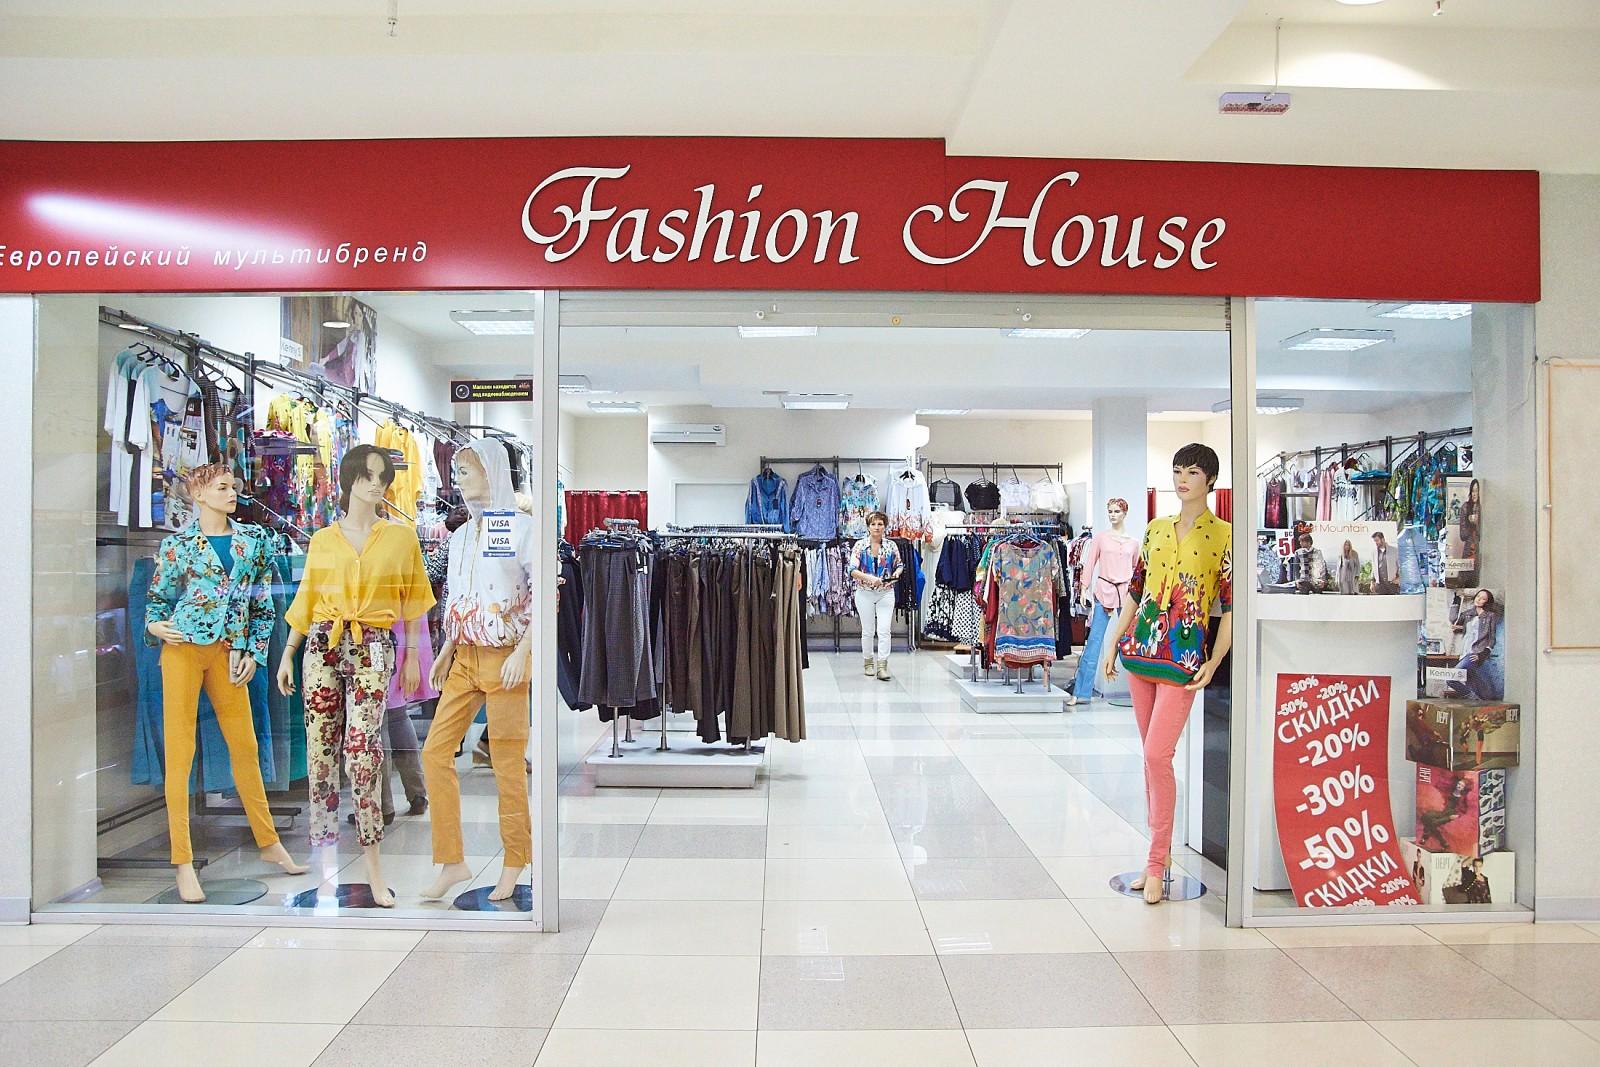 Studio s fashion house 84